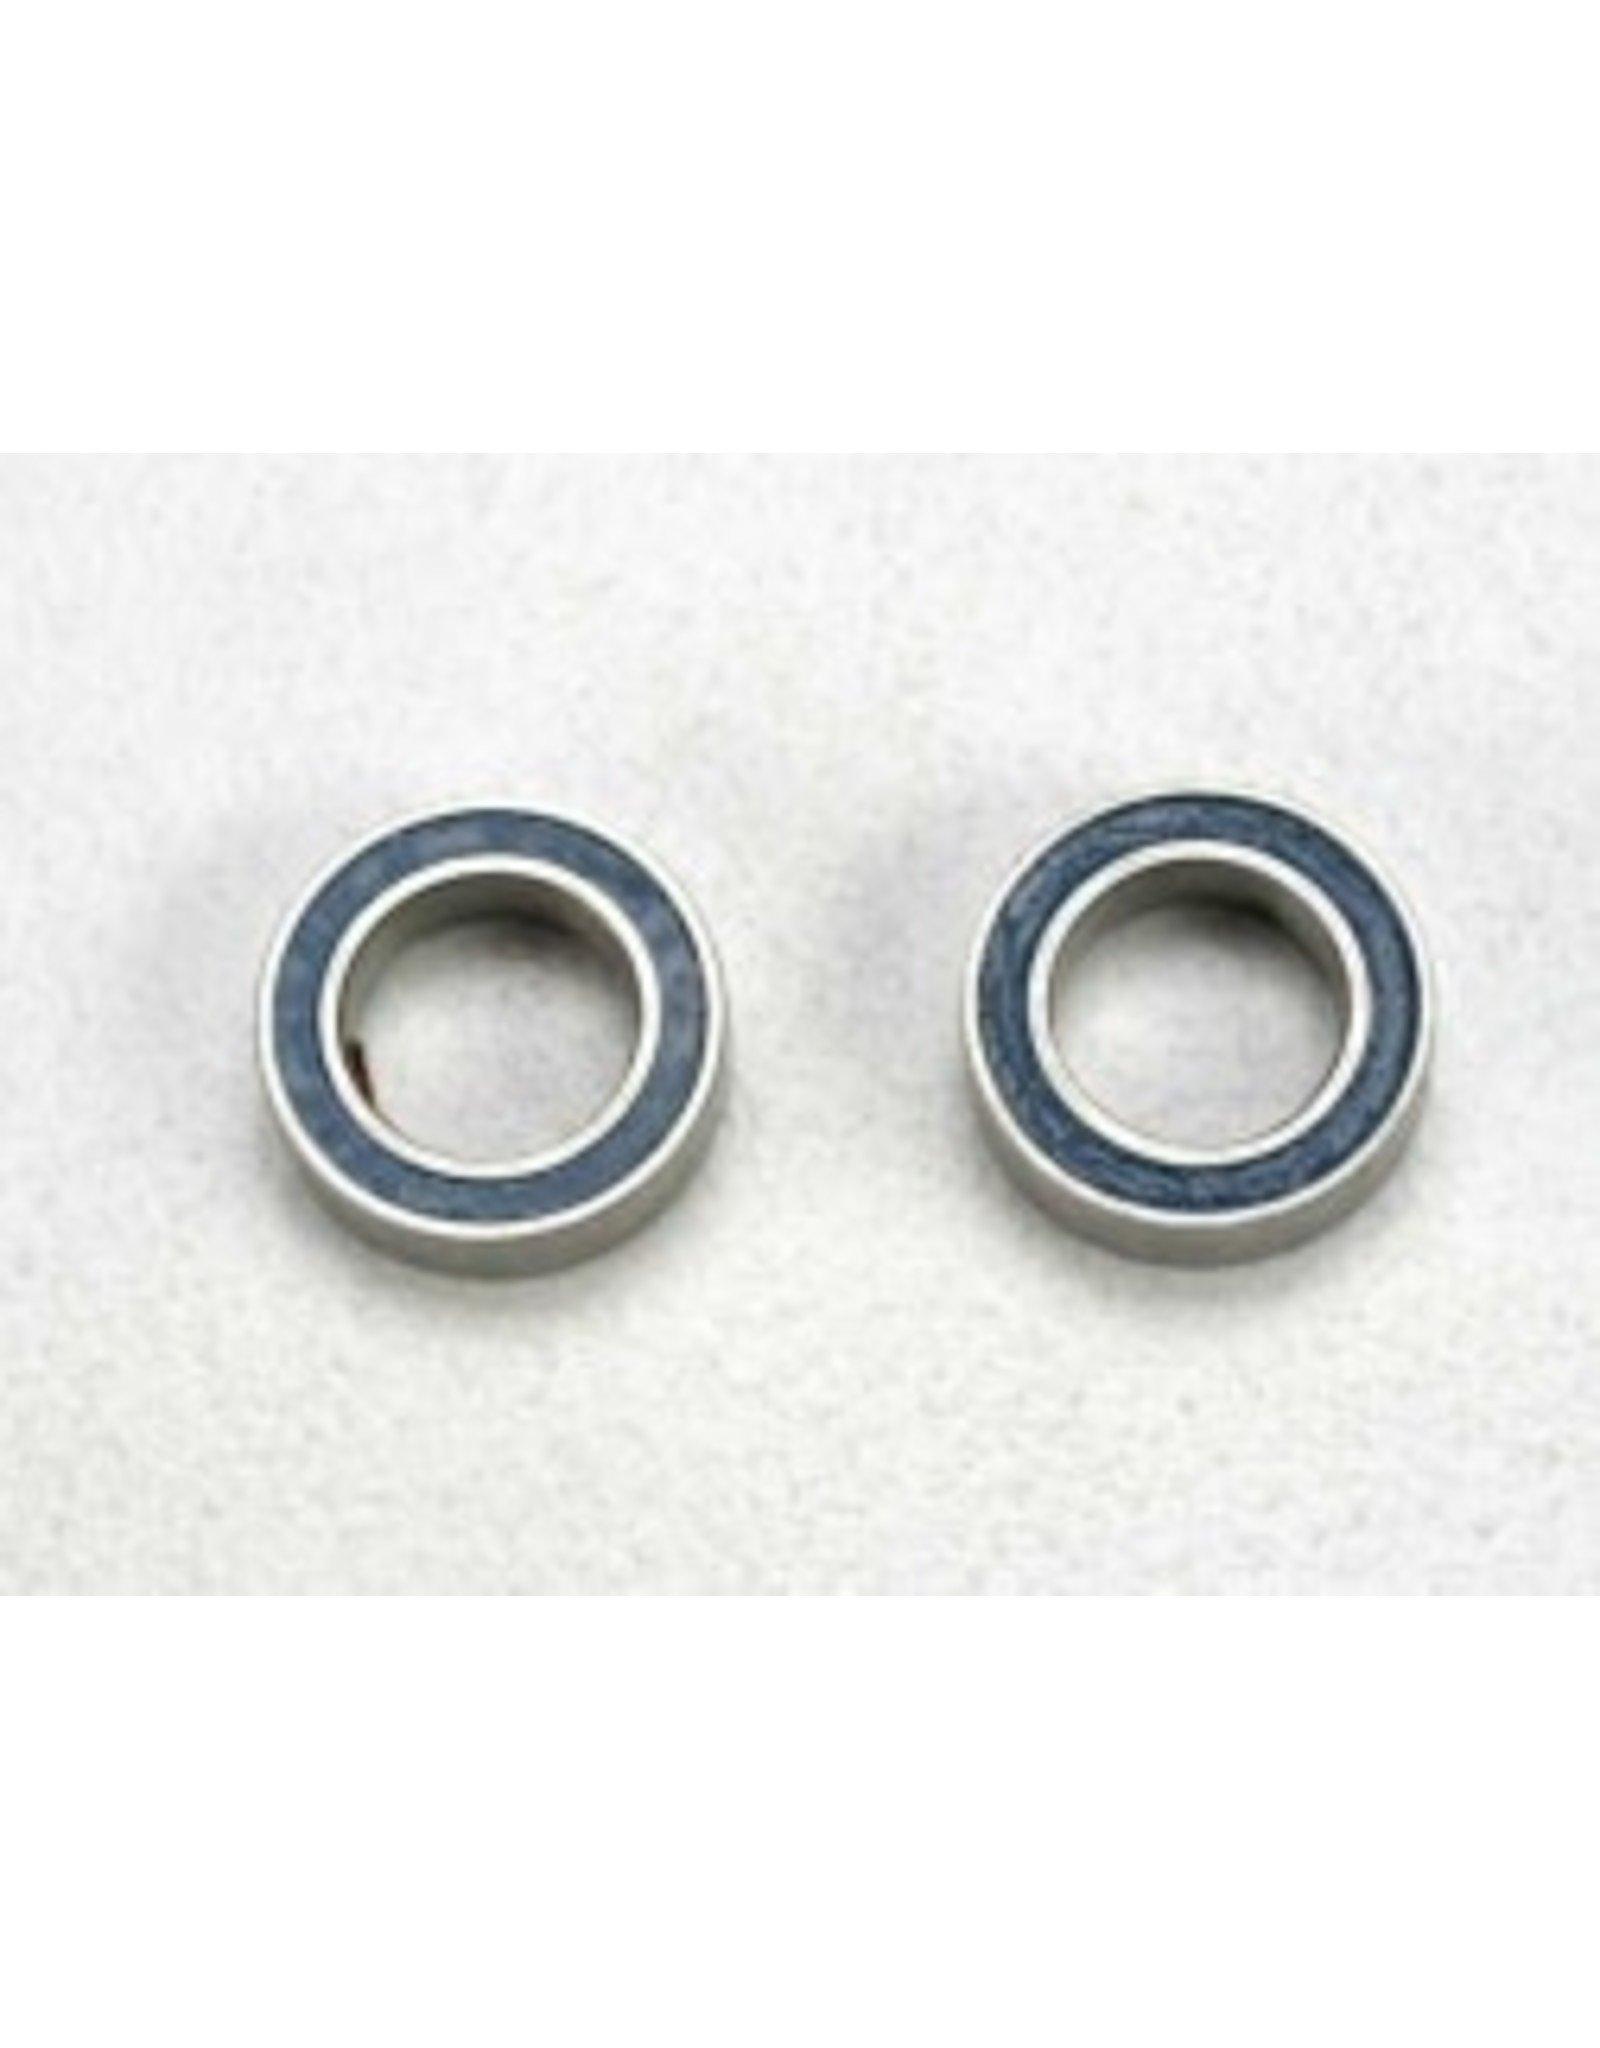 Traxxas Traxxas Ball bearings blue rubber (5x8x2mm) (2)